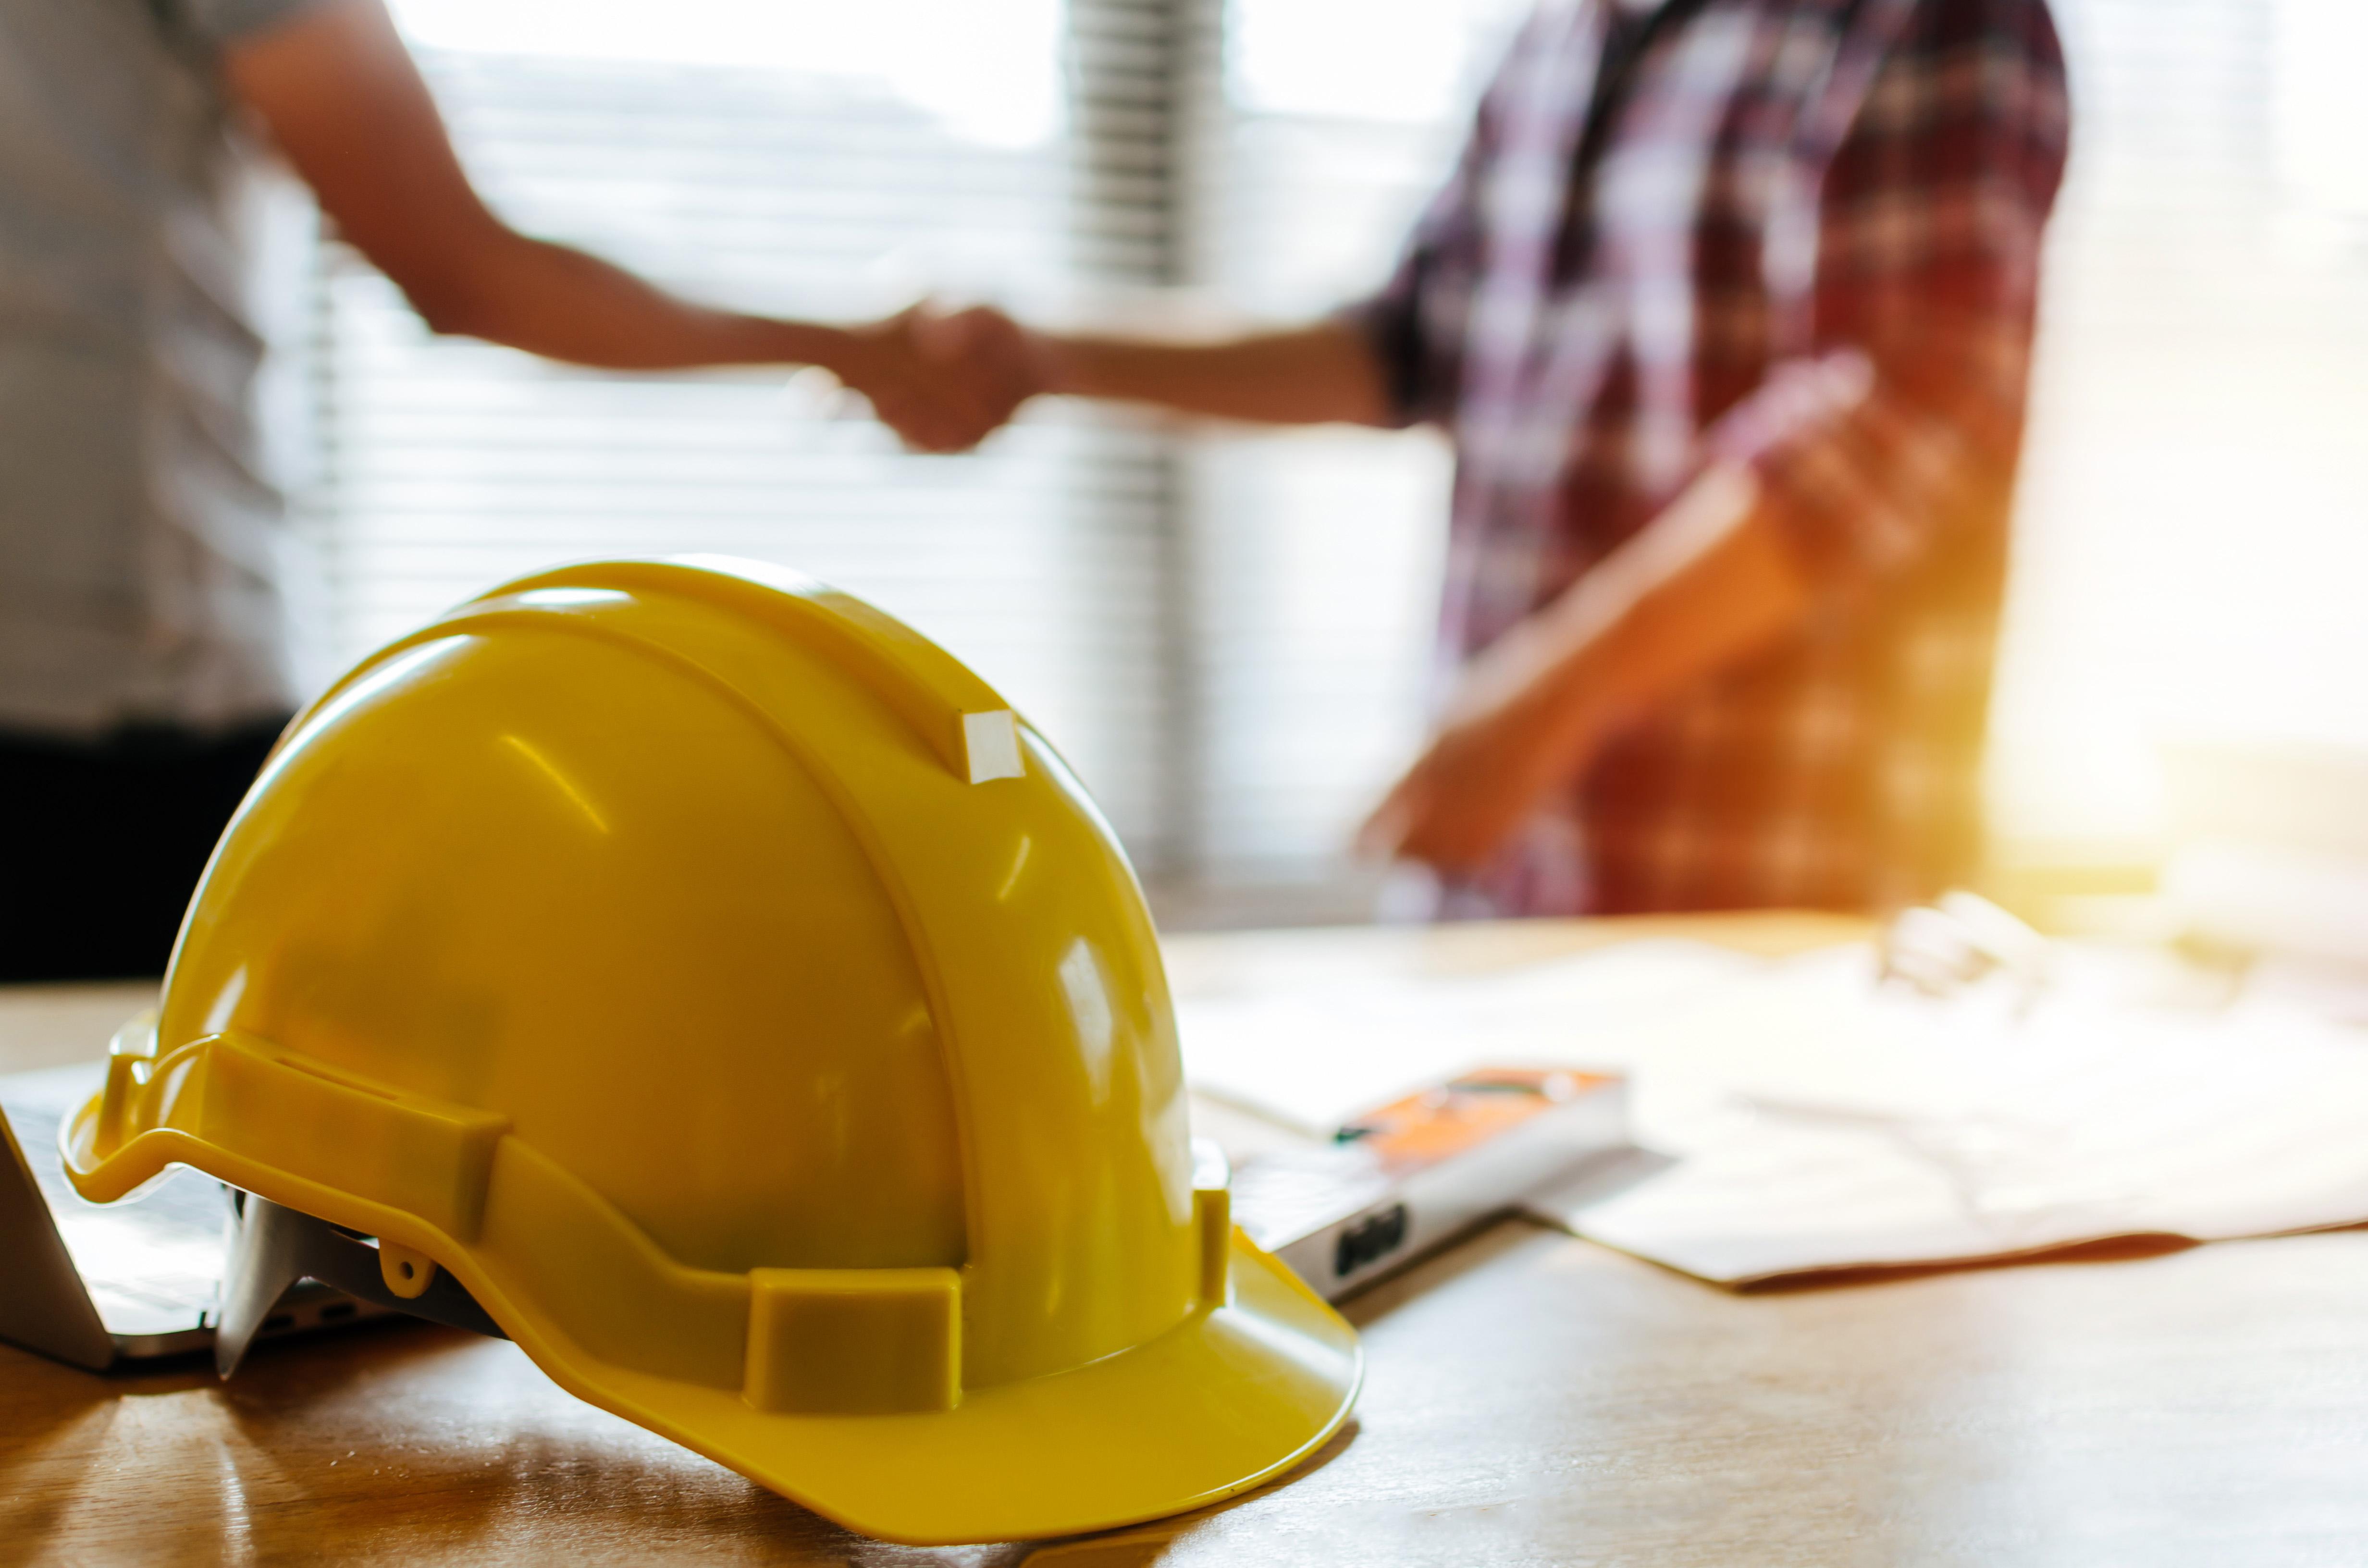 Covid 19 Lockdown Hits New Civil Engineering Projects New Civil Engineer